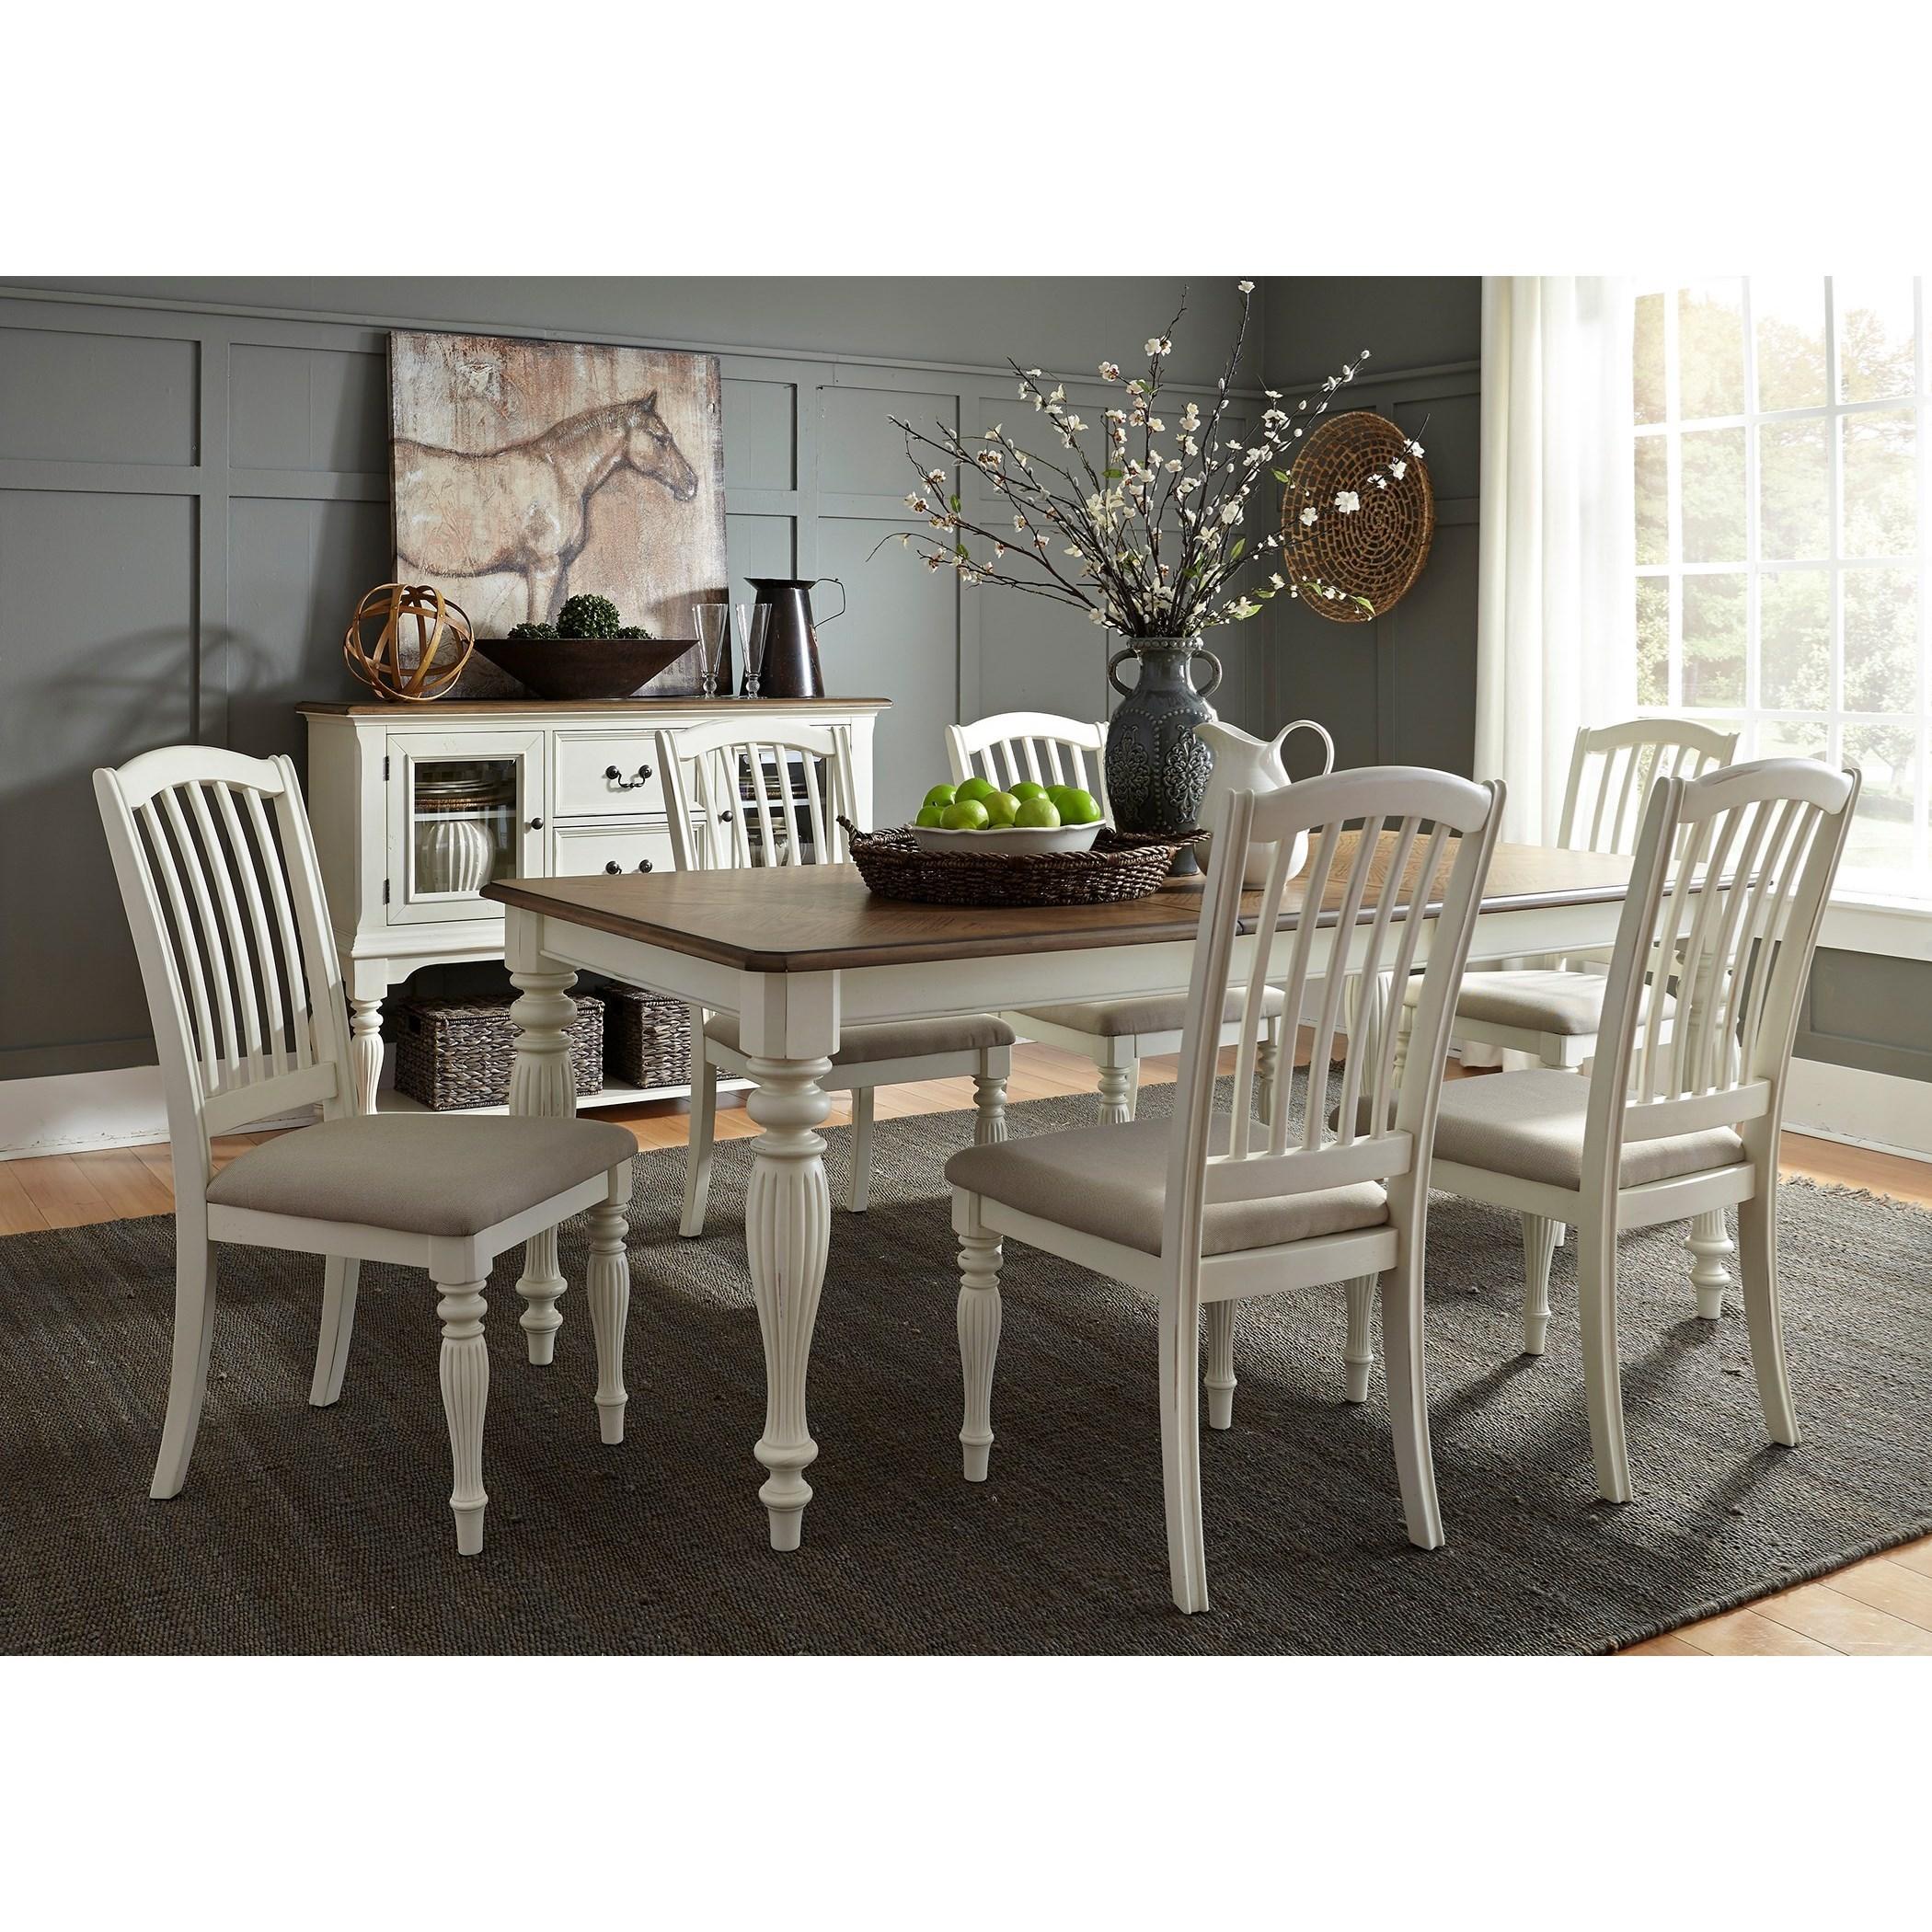 Sarah Randolph Designs Cumberland Creek Dining Formal Dining Room Group